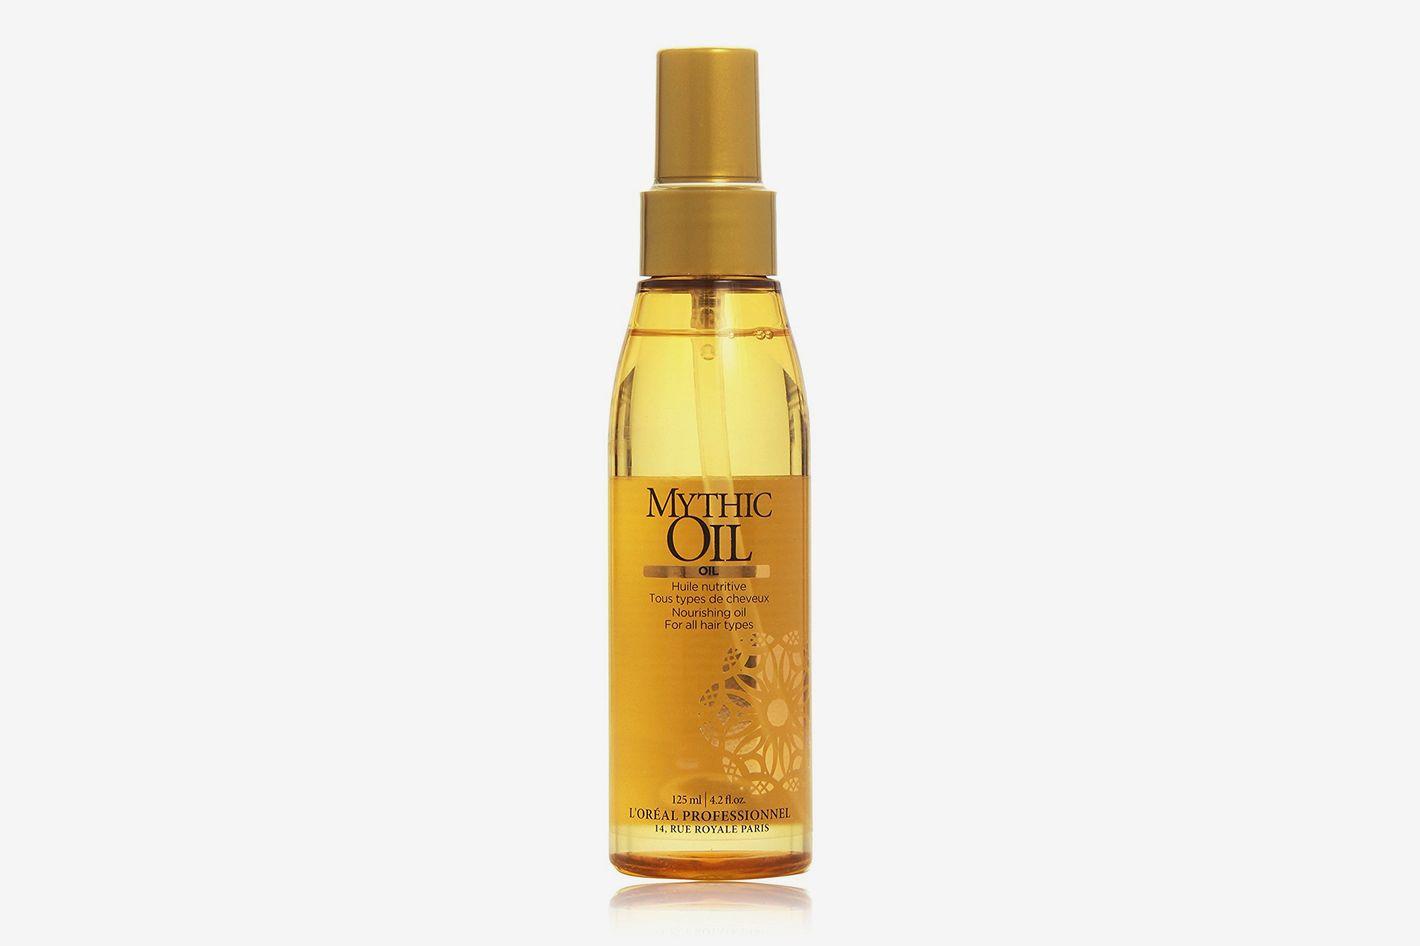 L'Oréal Professional Mythic Nourishing Oil